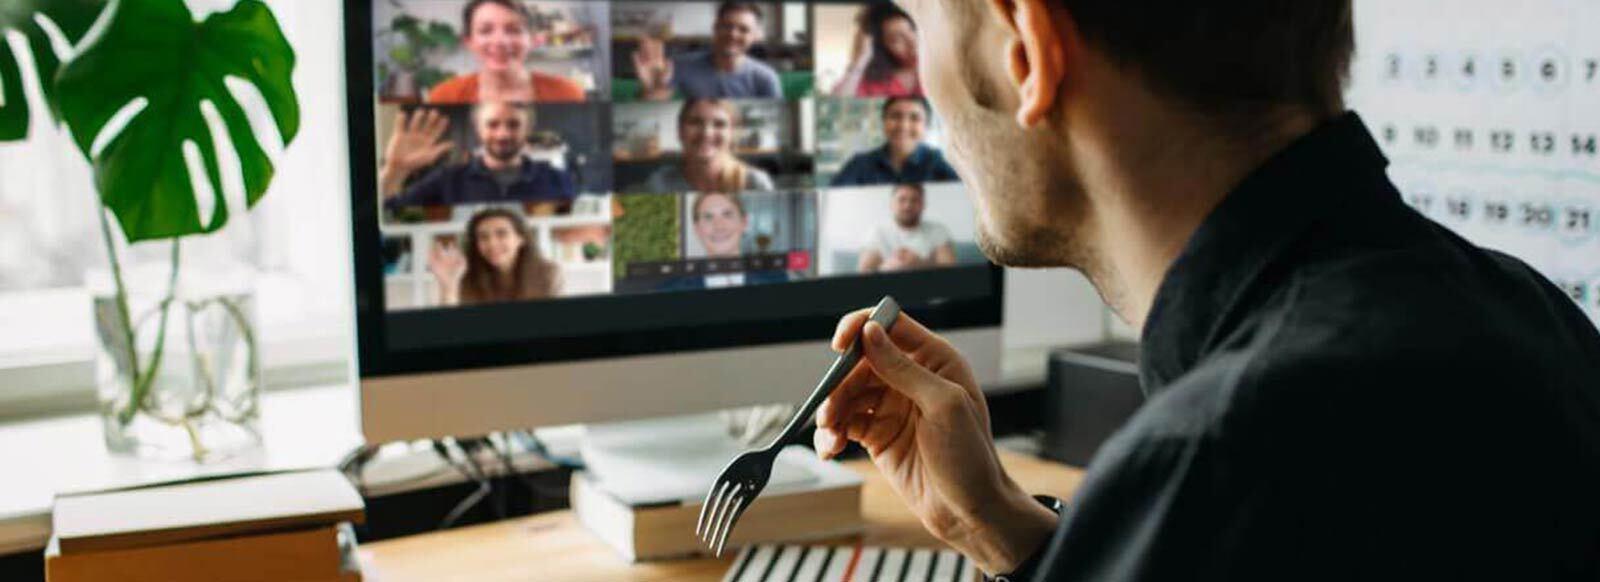 JET header videocall takeaway 1600